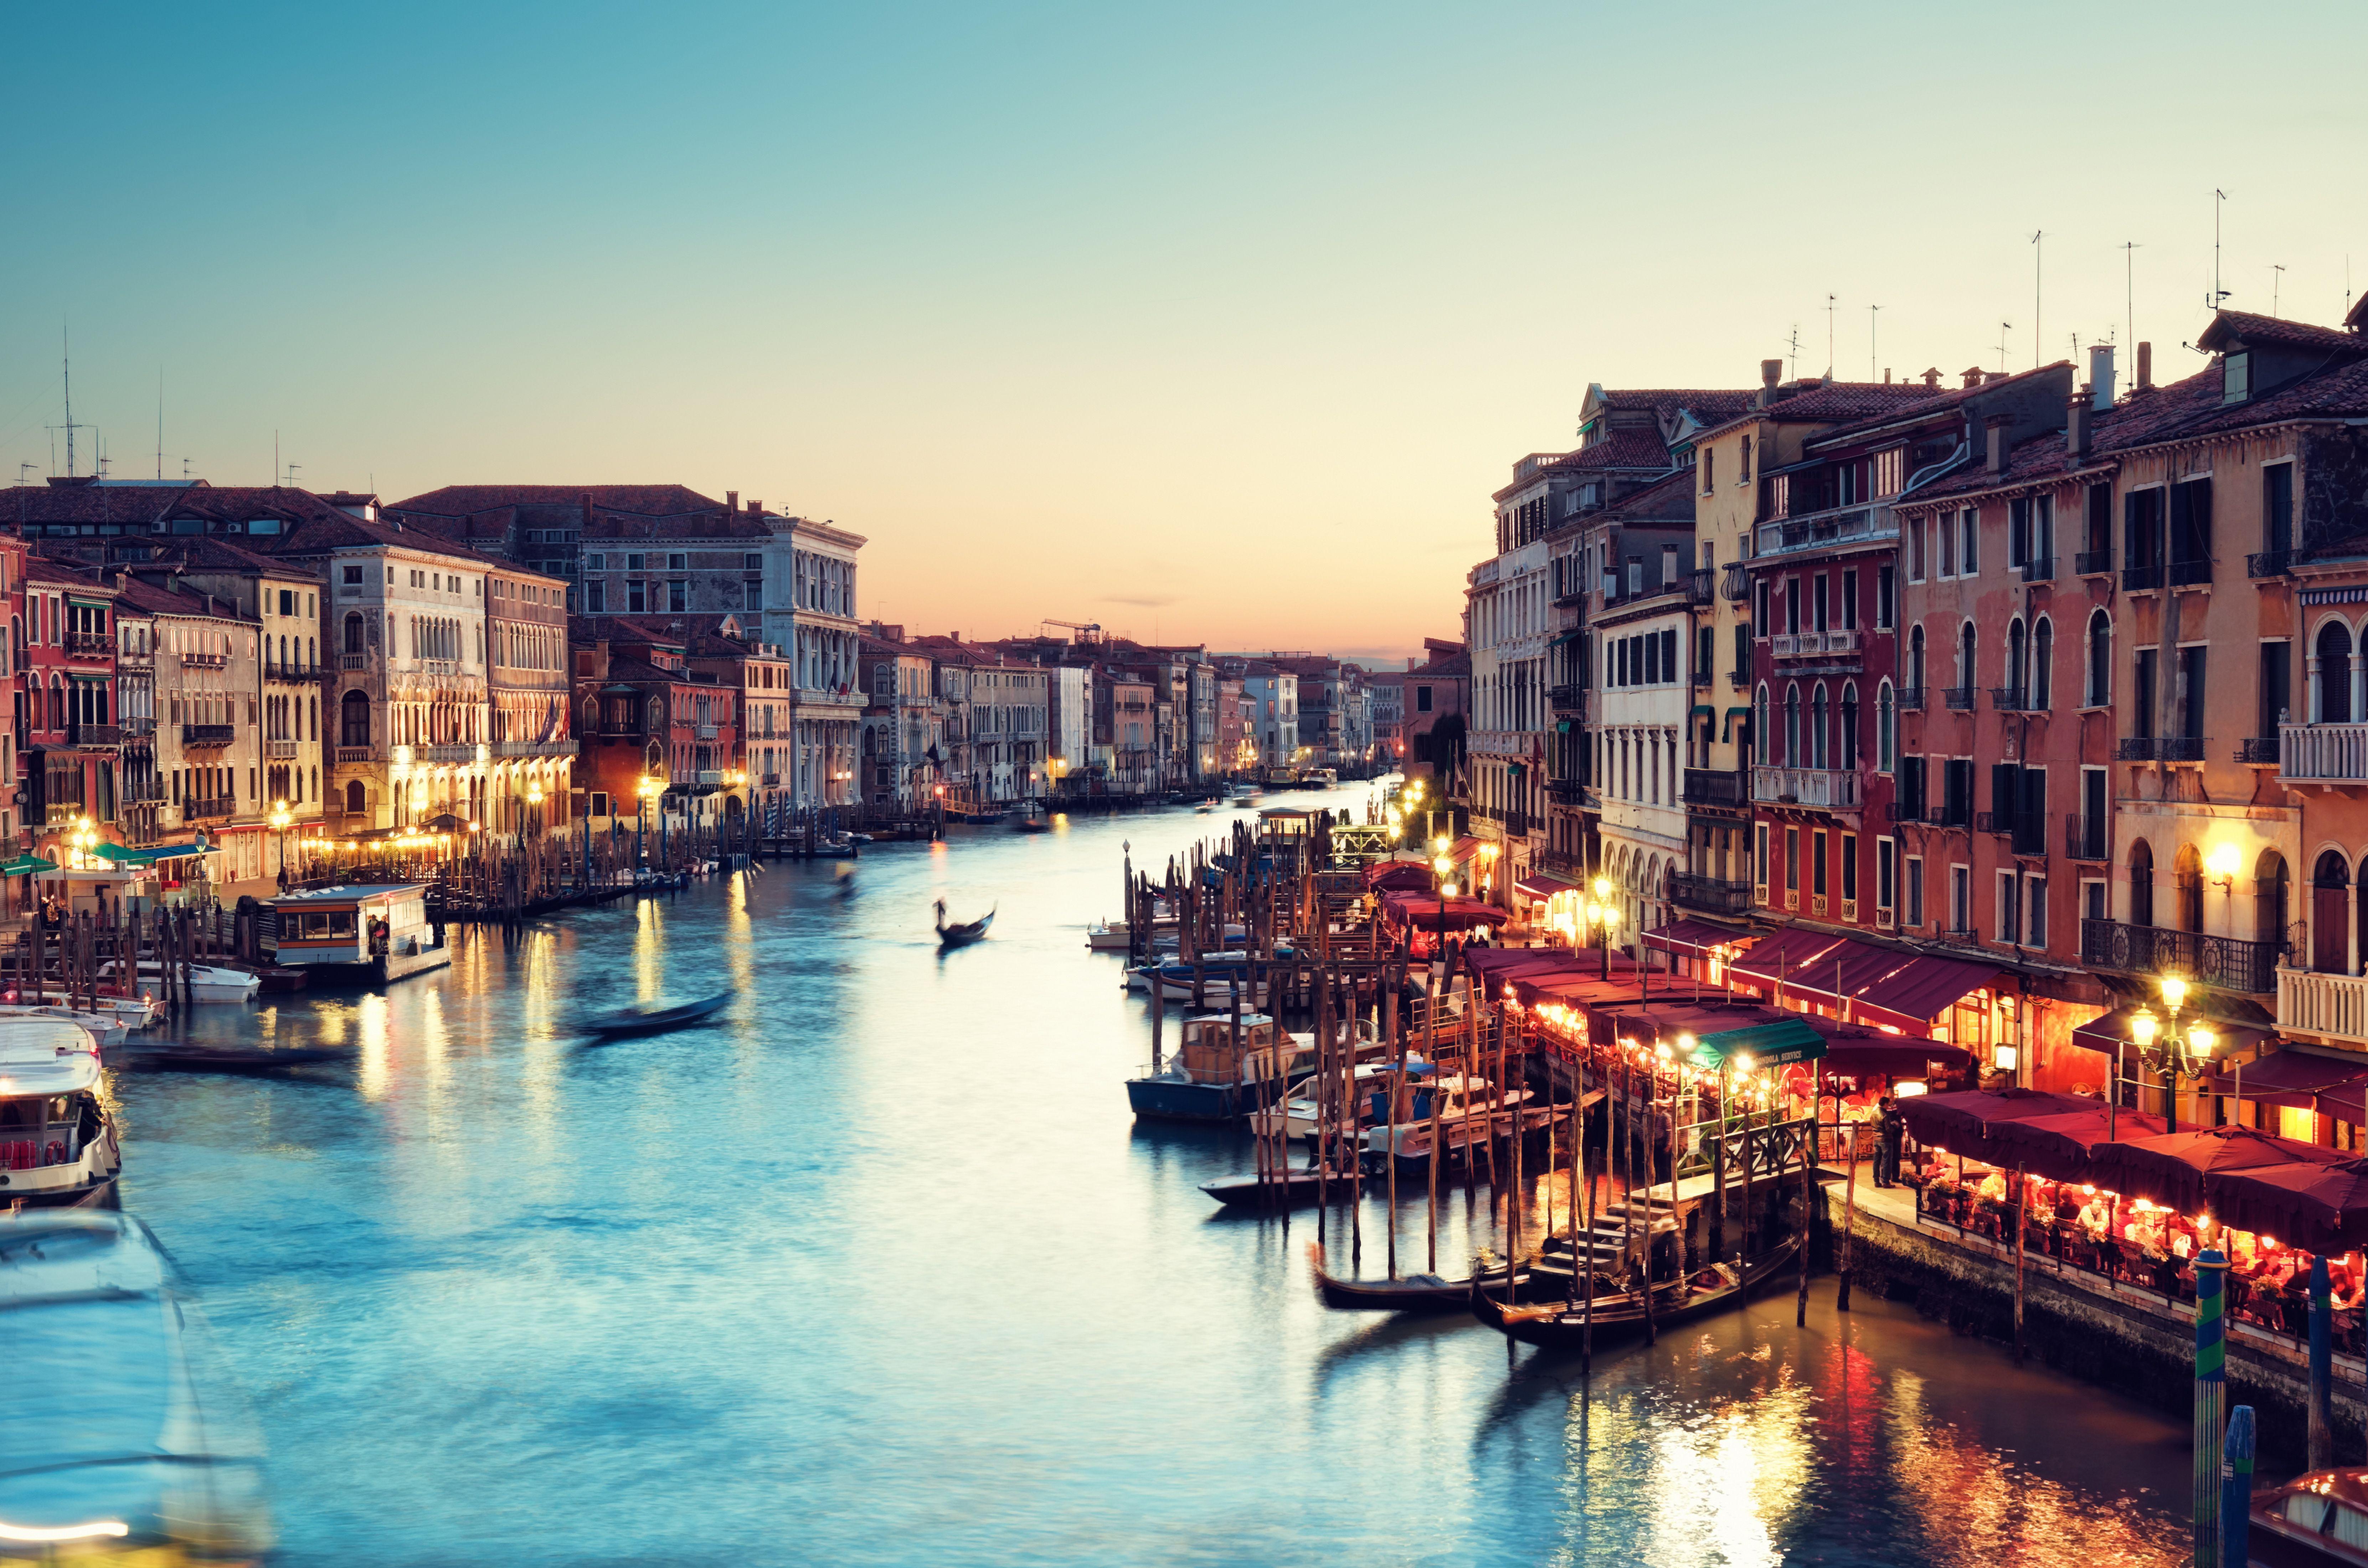 om Venezia